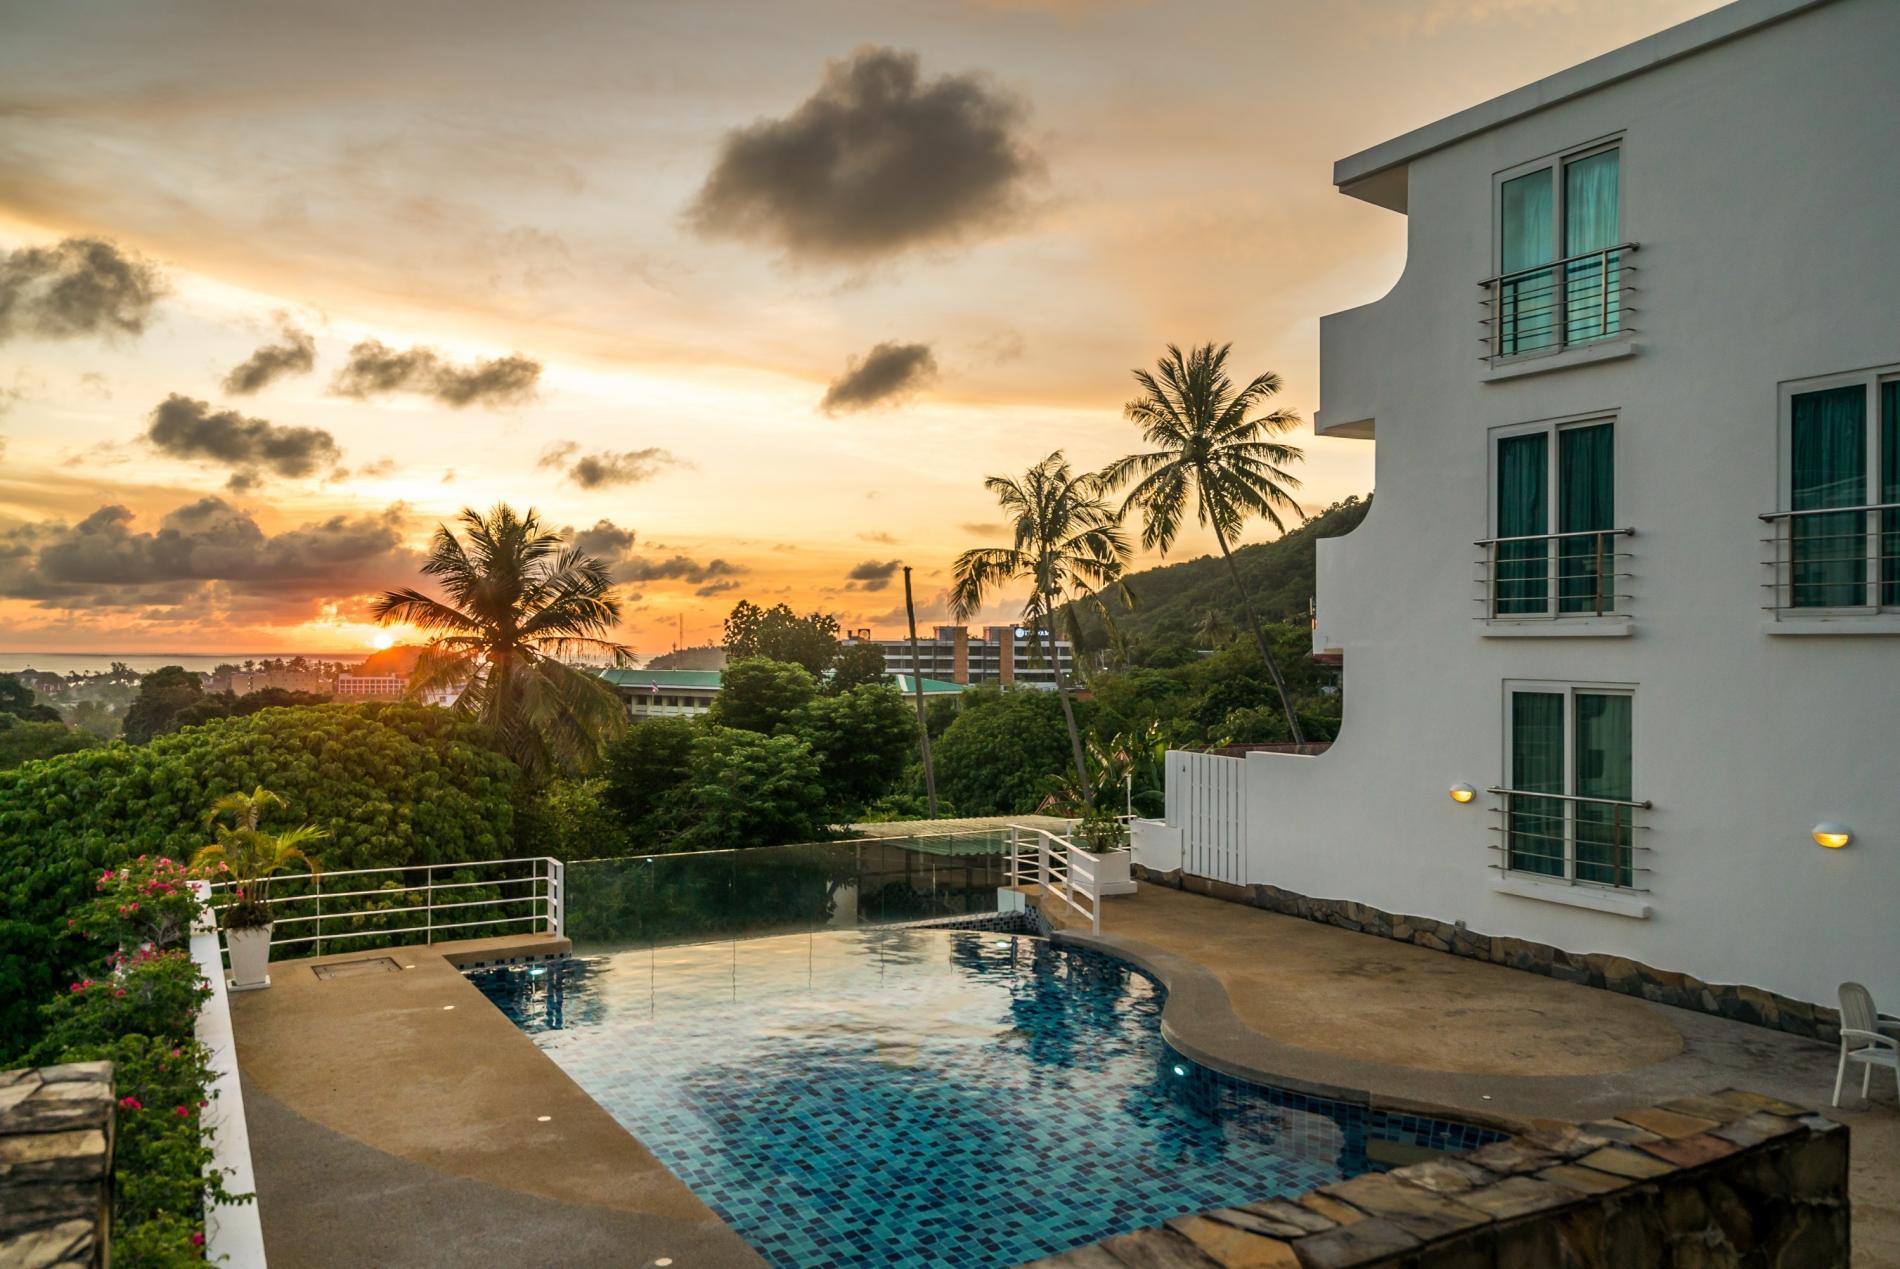 Apartment Kata Ocean View condominium - 1 bdr mountain view apartment photo 20177683